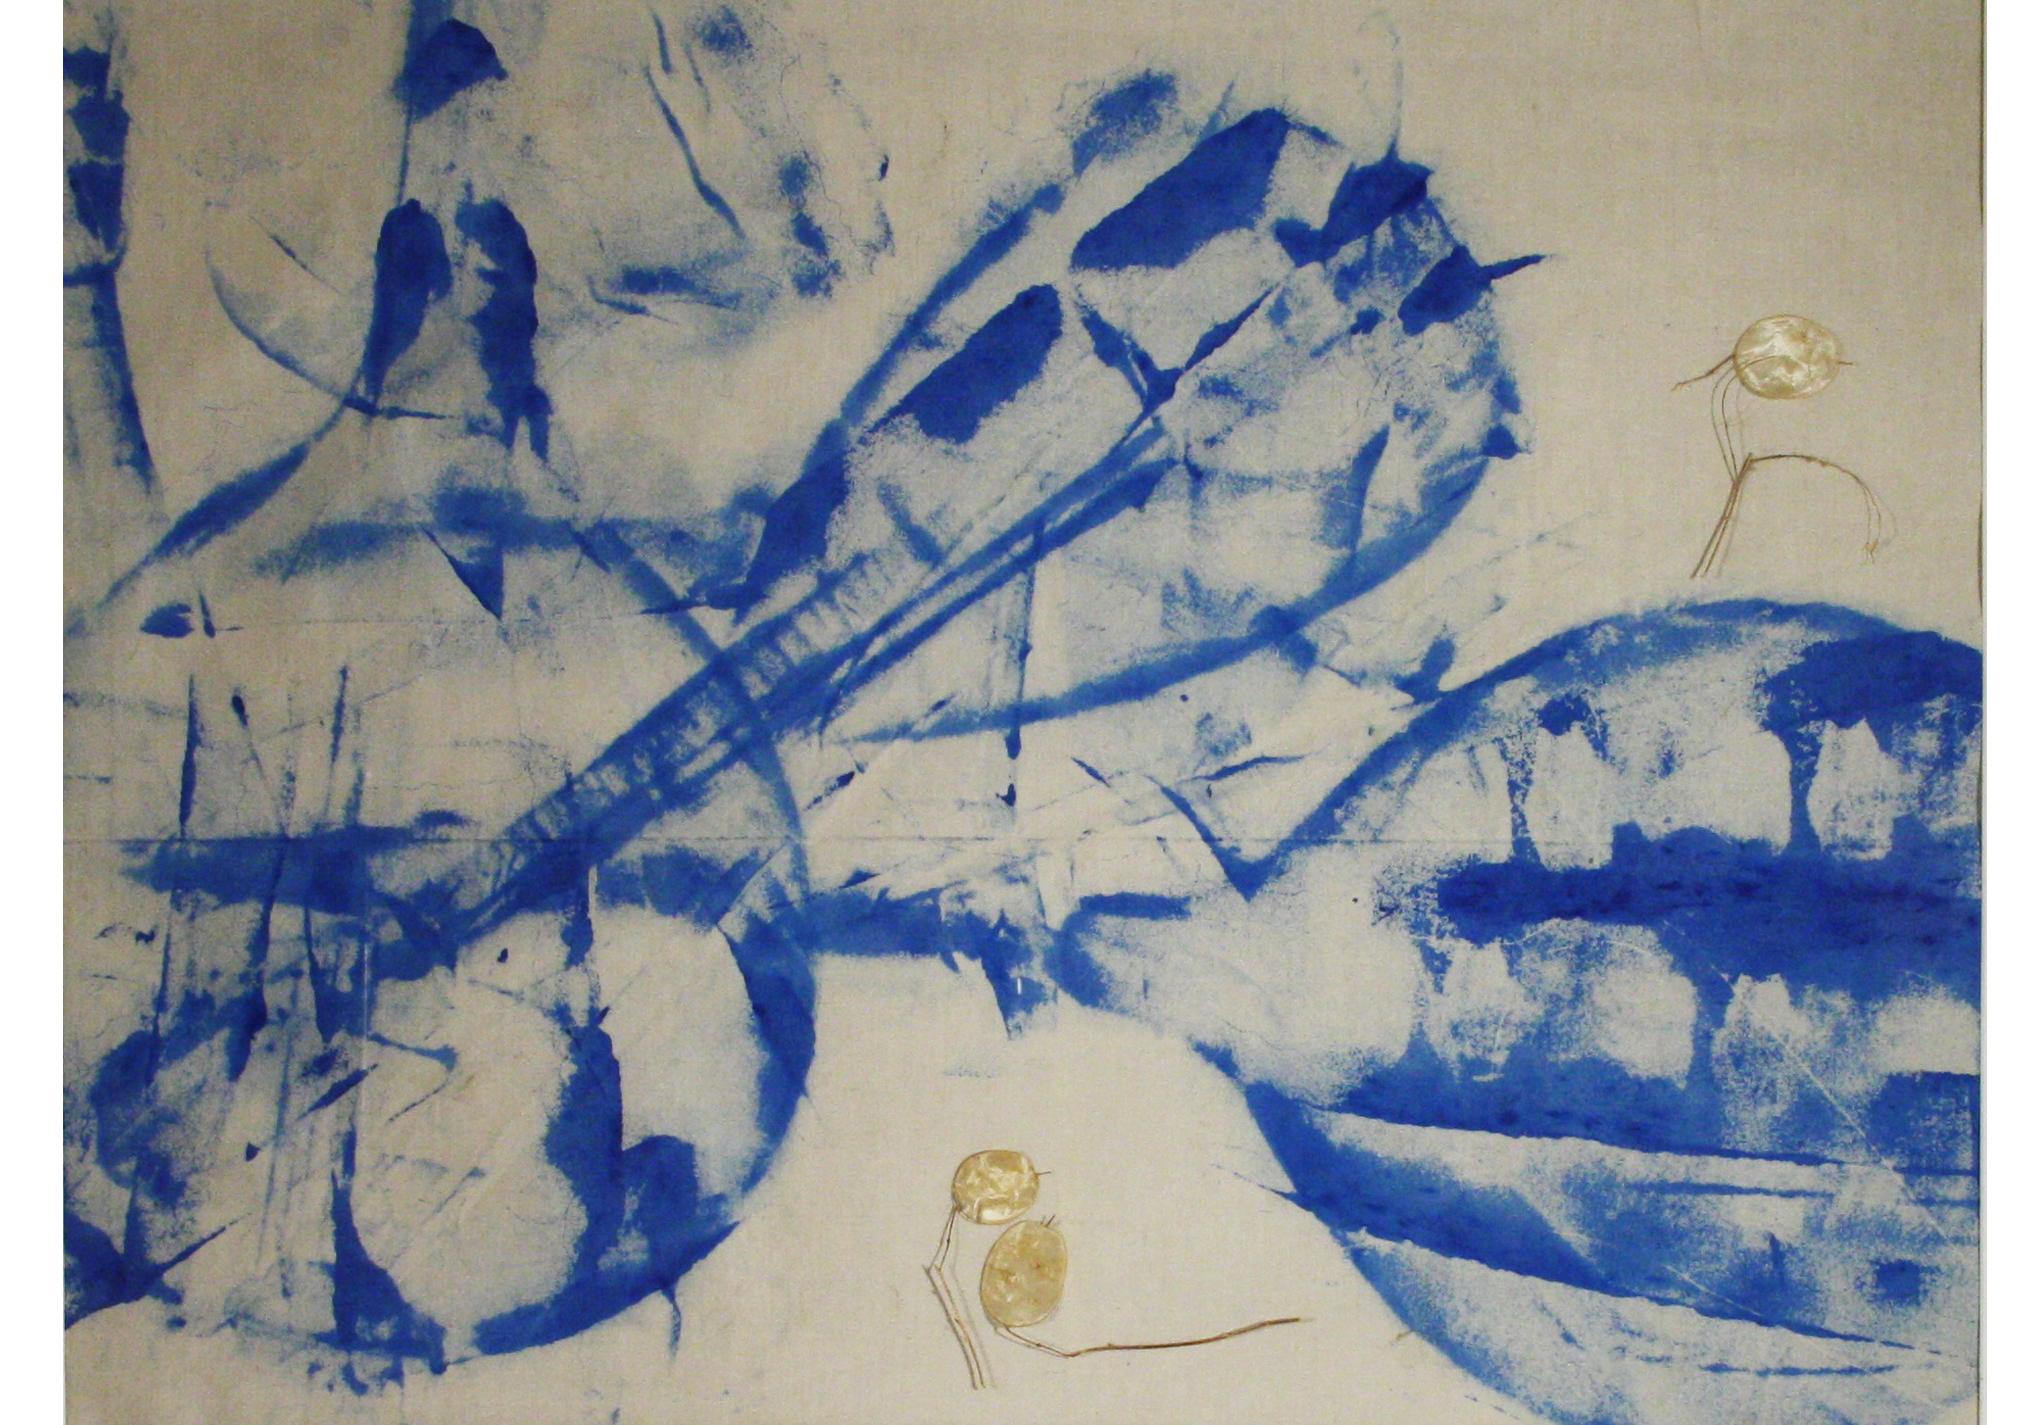 002-Magret-Döring-Lautenklang-Silberblatt---Acryl,-Frottage,-Assemblage-auf-Stoff